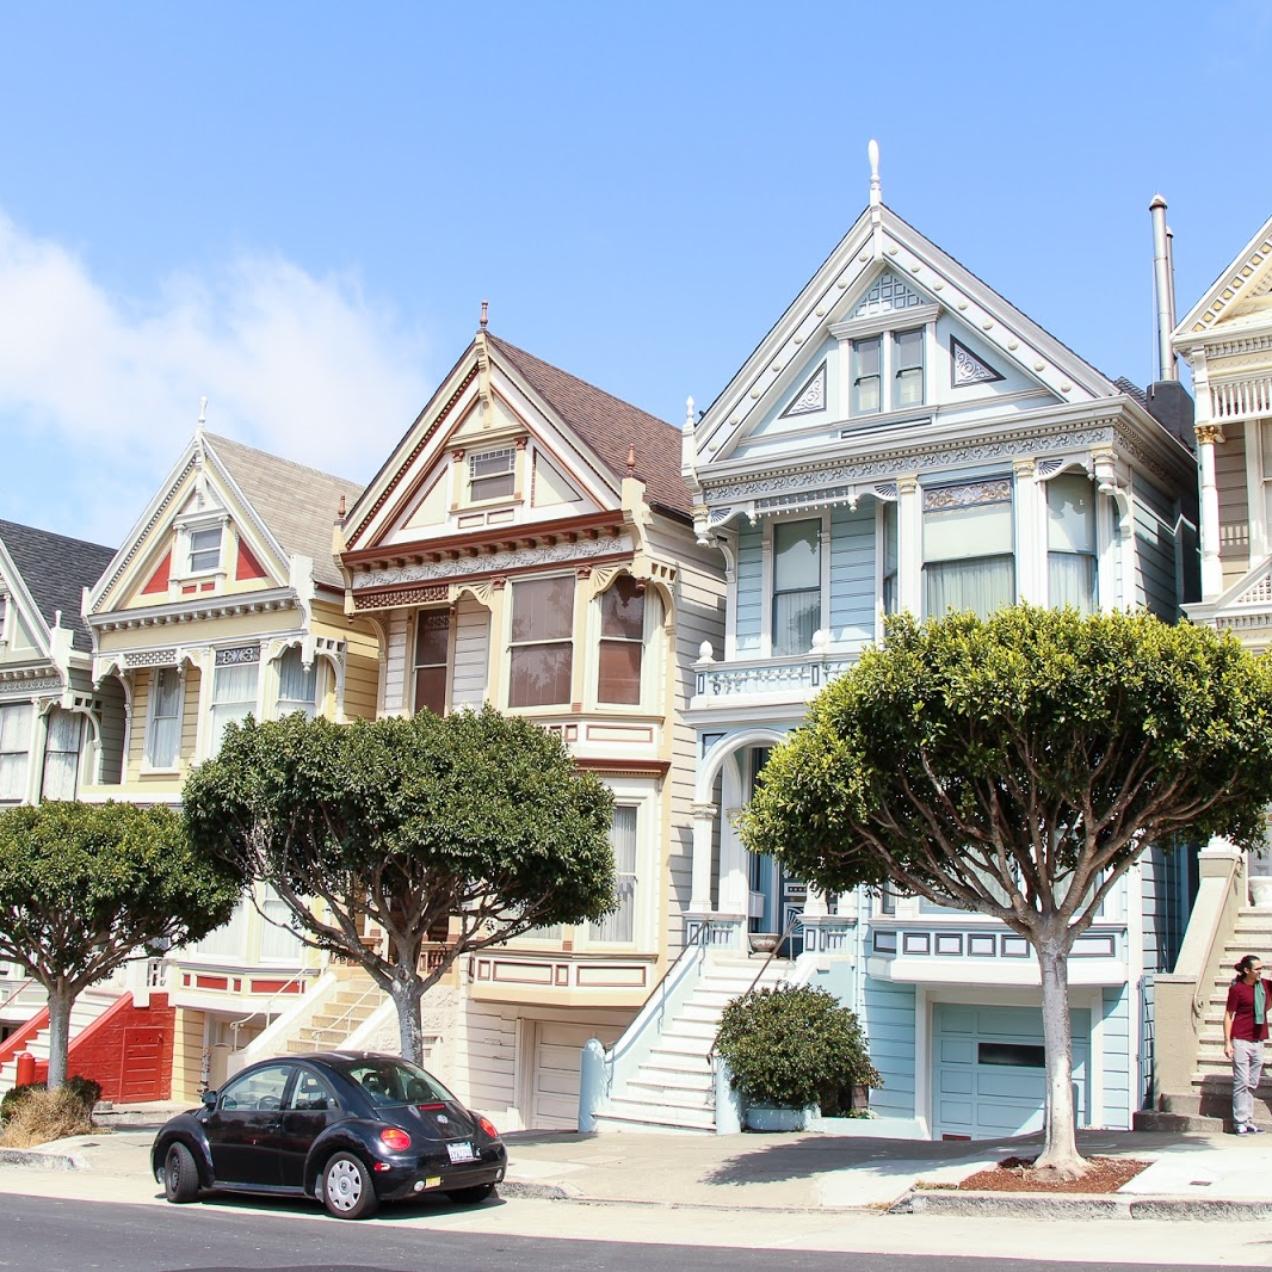 San Francisco (Road Trip USA #1)